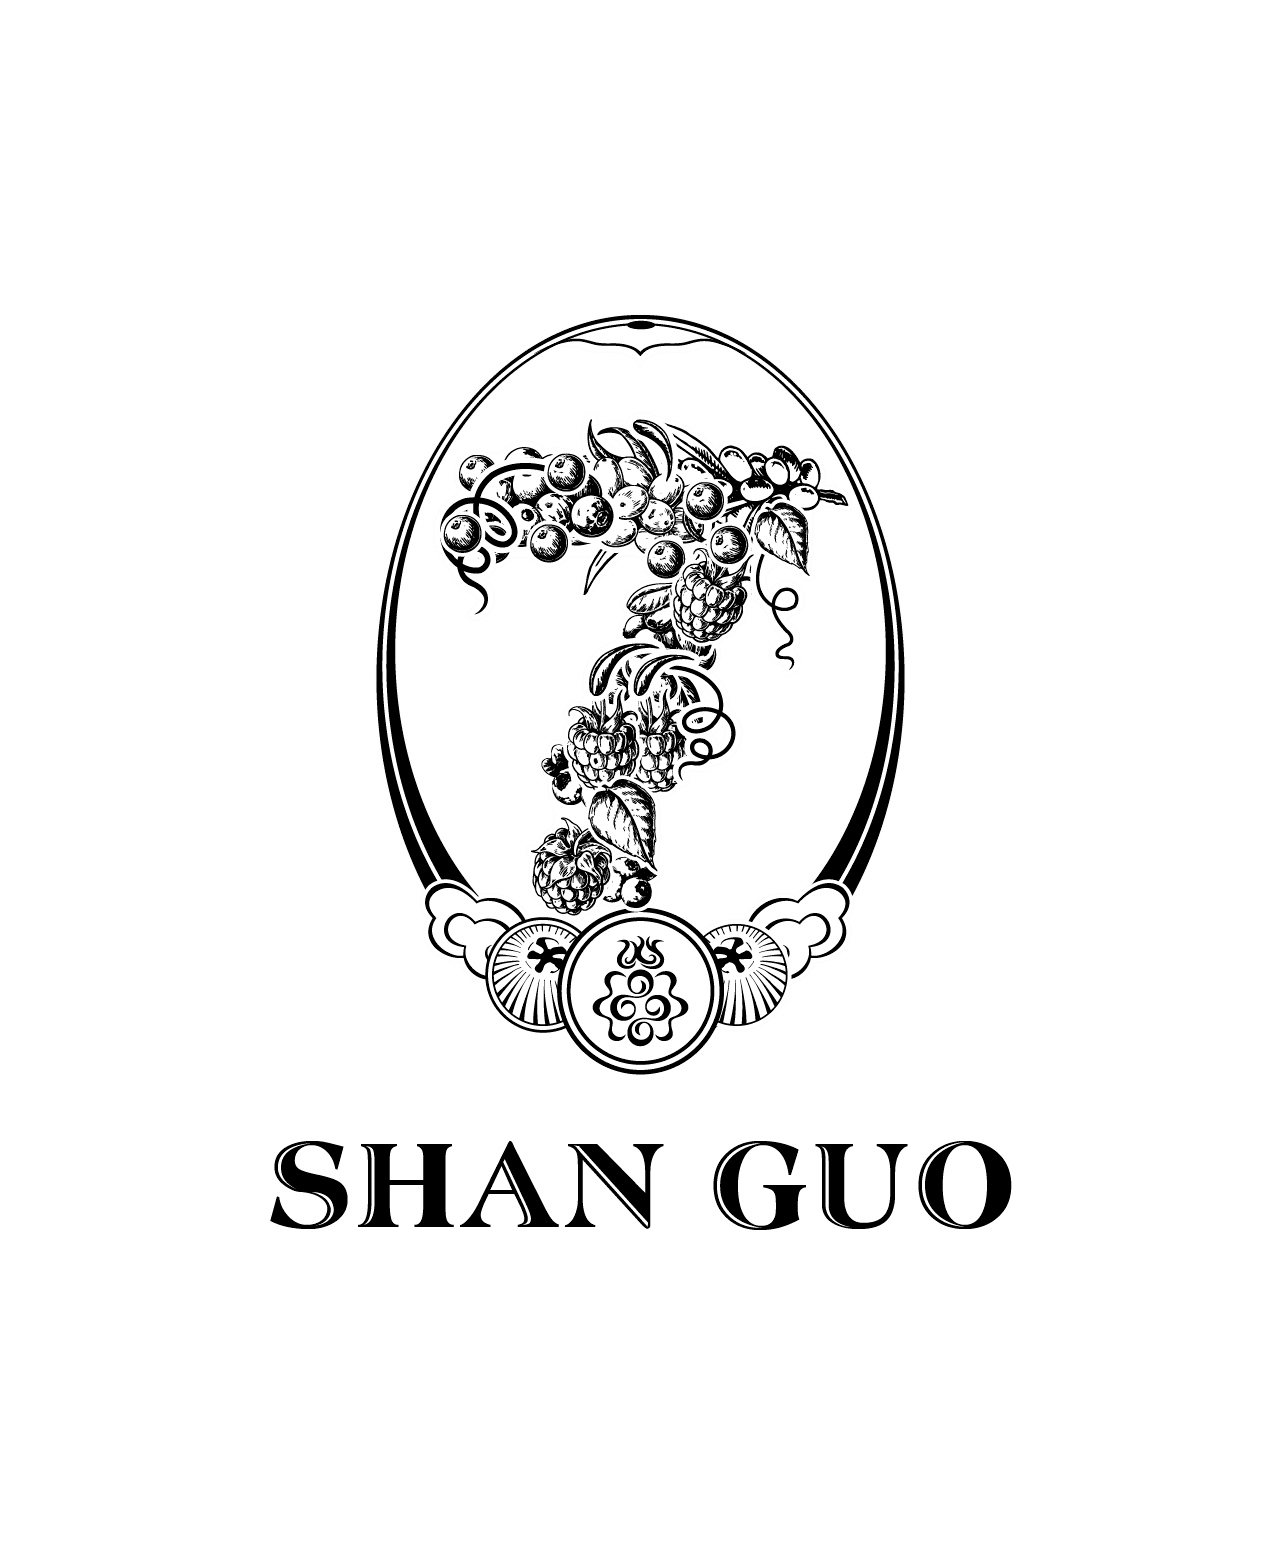 Bildmarke: SHAN GUO